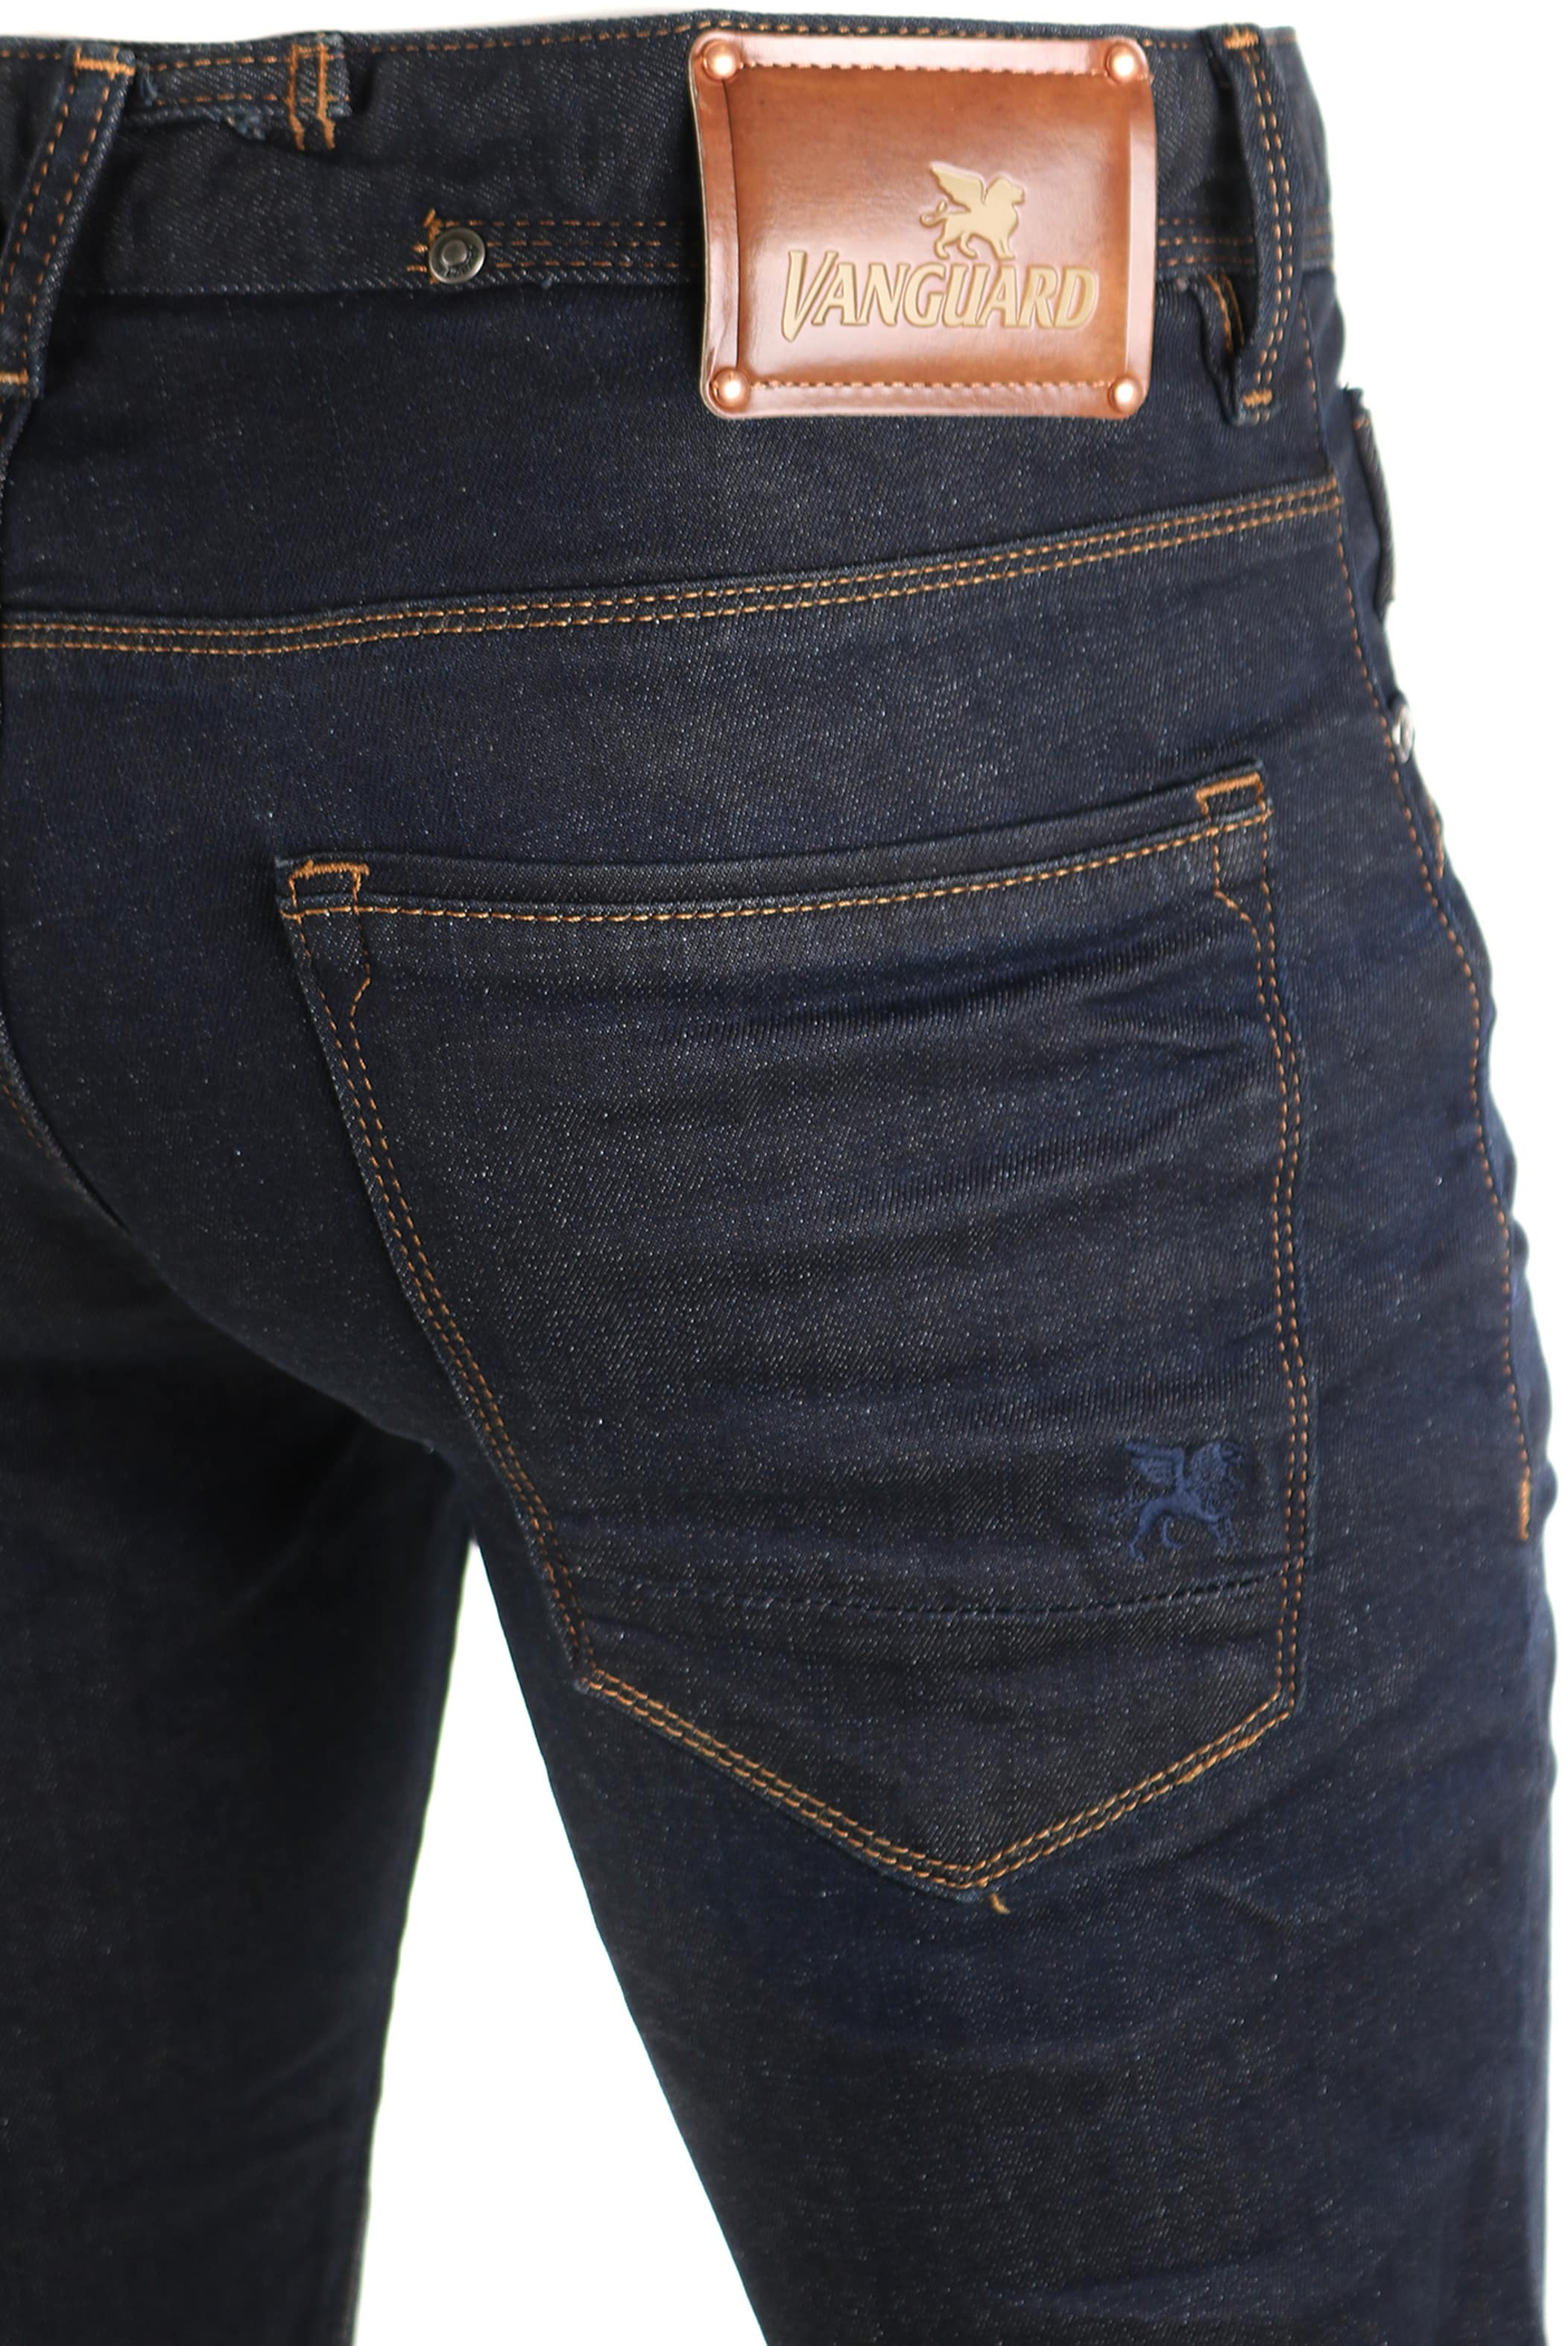 Vanguard V7 Rider Jeans Slim Fit CCR foto 3